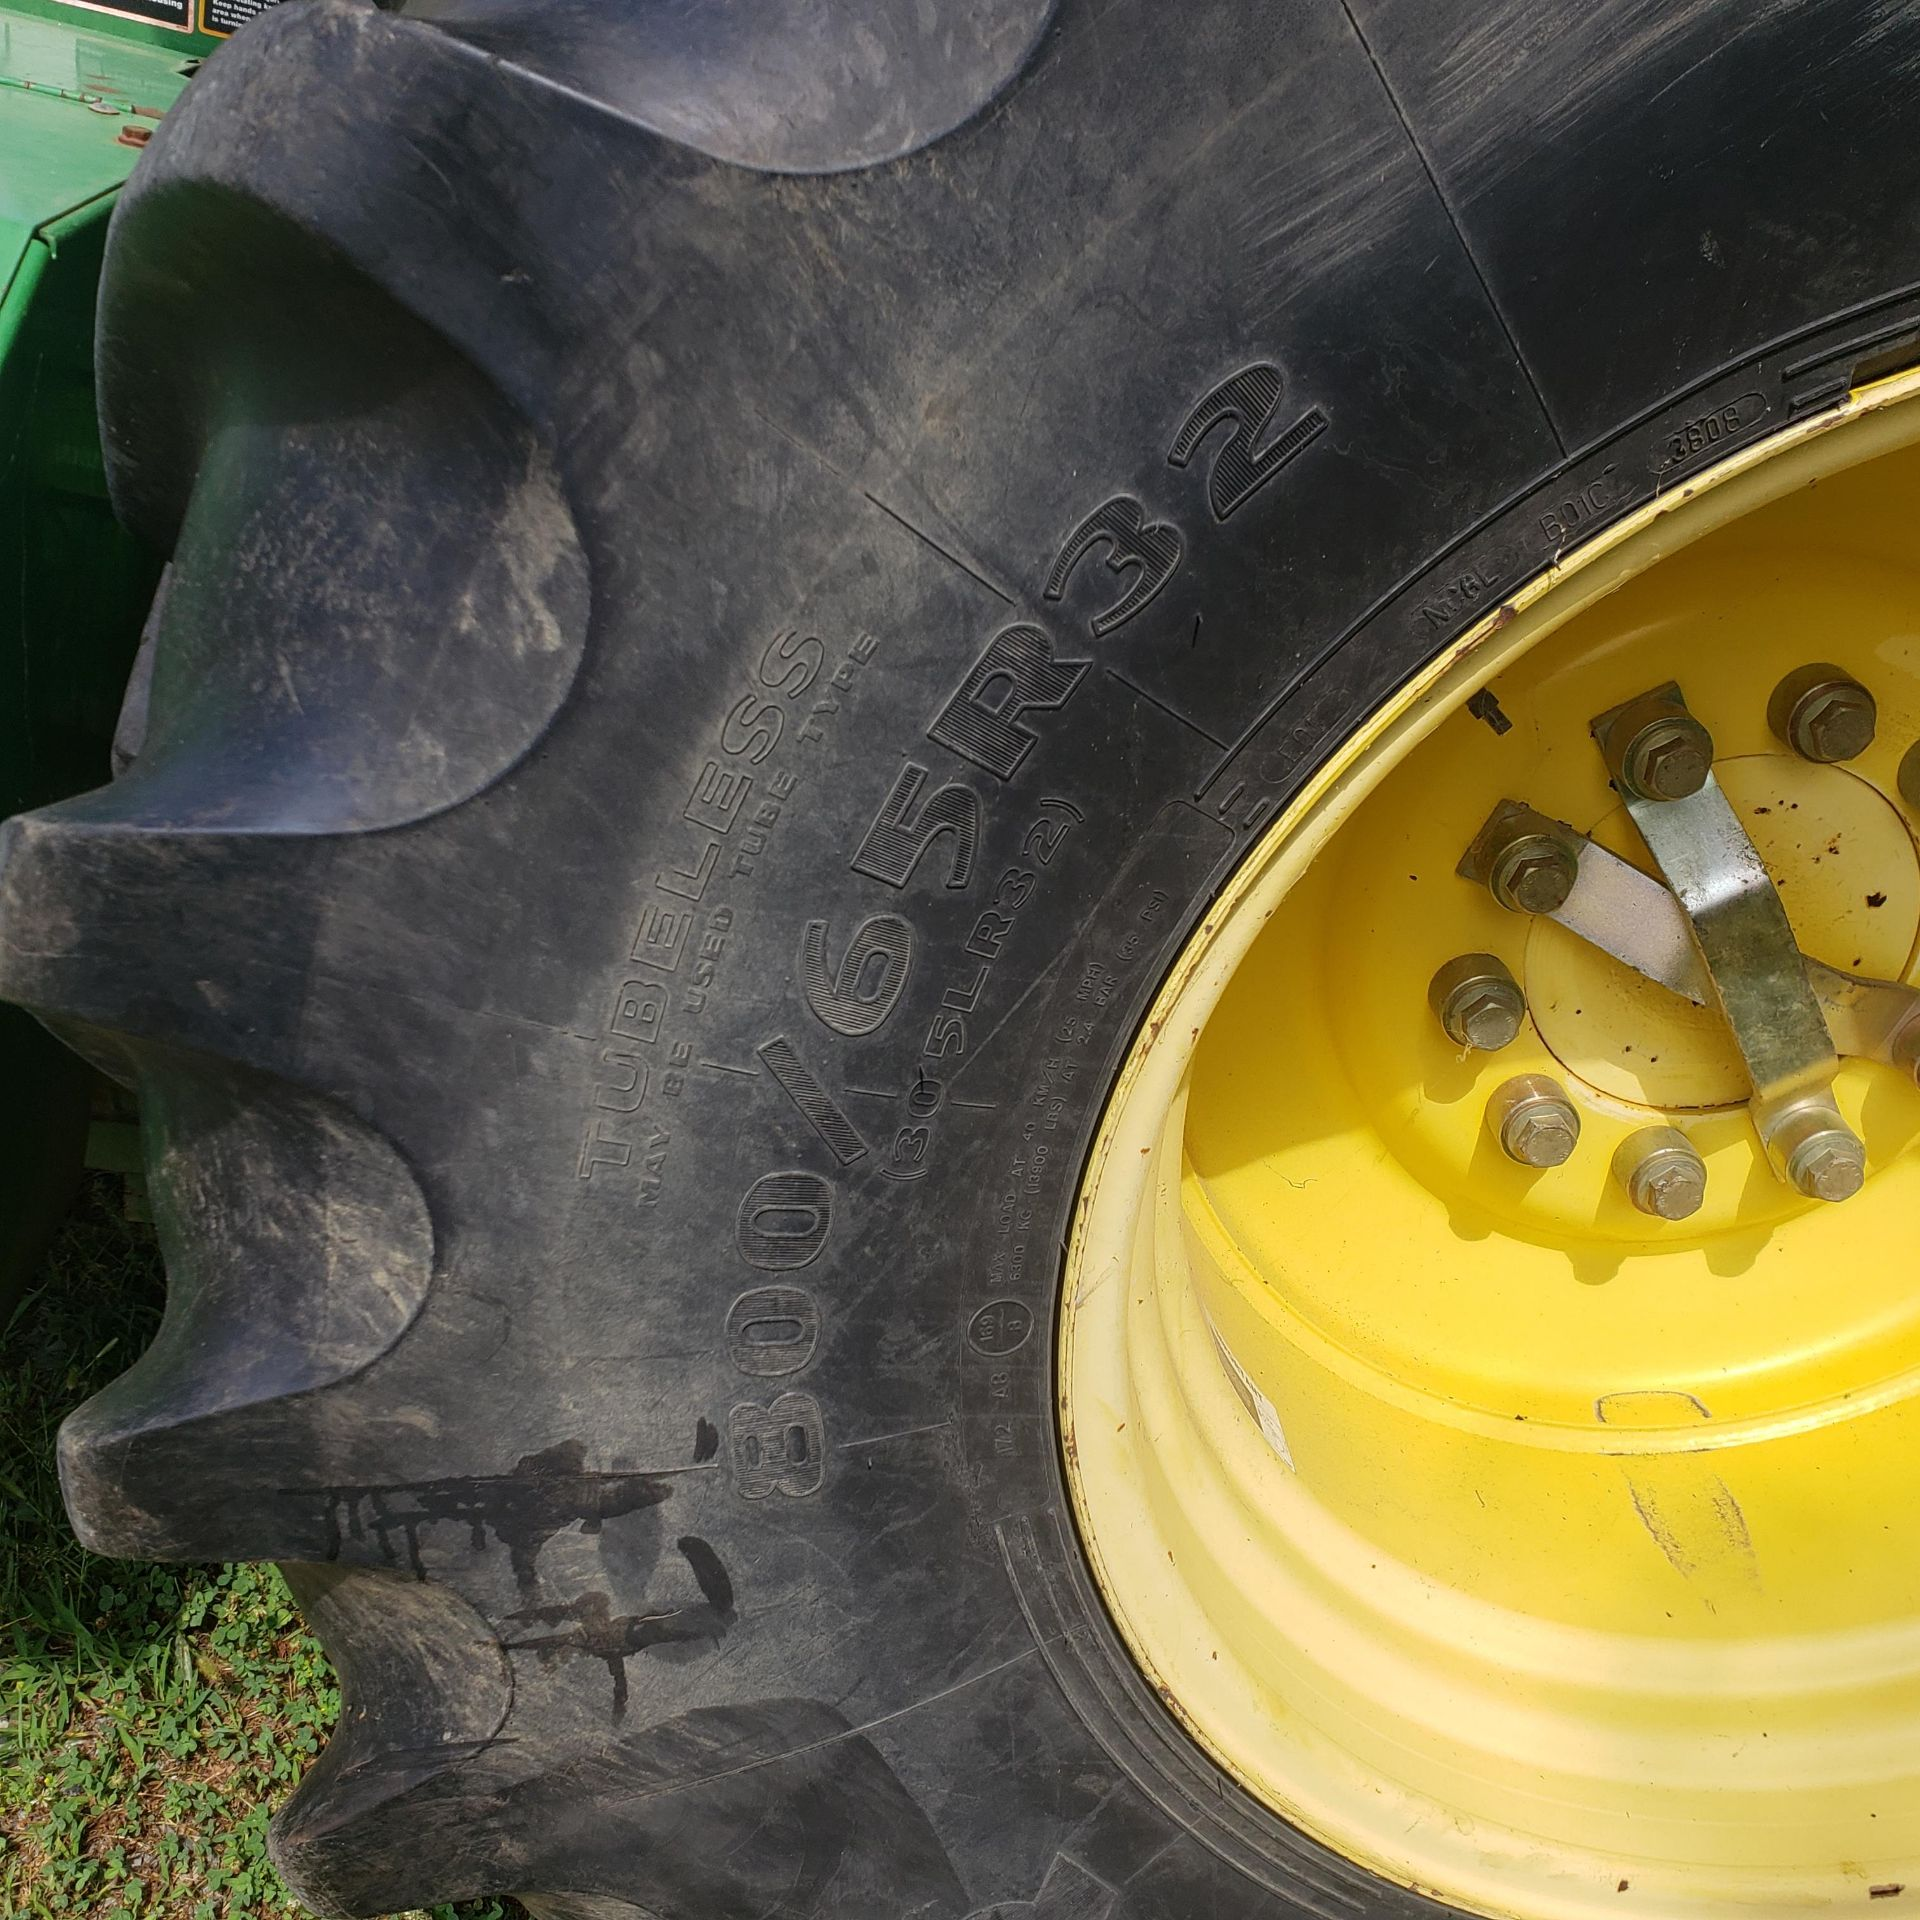 Used-John Deere 7450 Tractor. Model 7450. 1881 hrs. 688 Chopper Head - Image 8 of 10